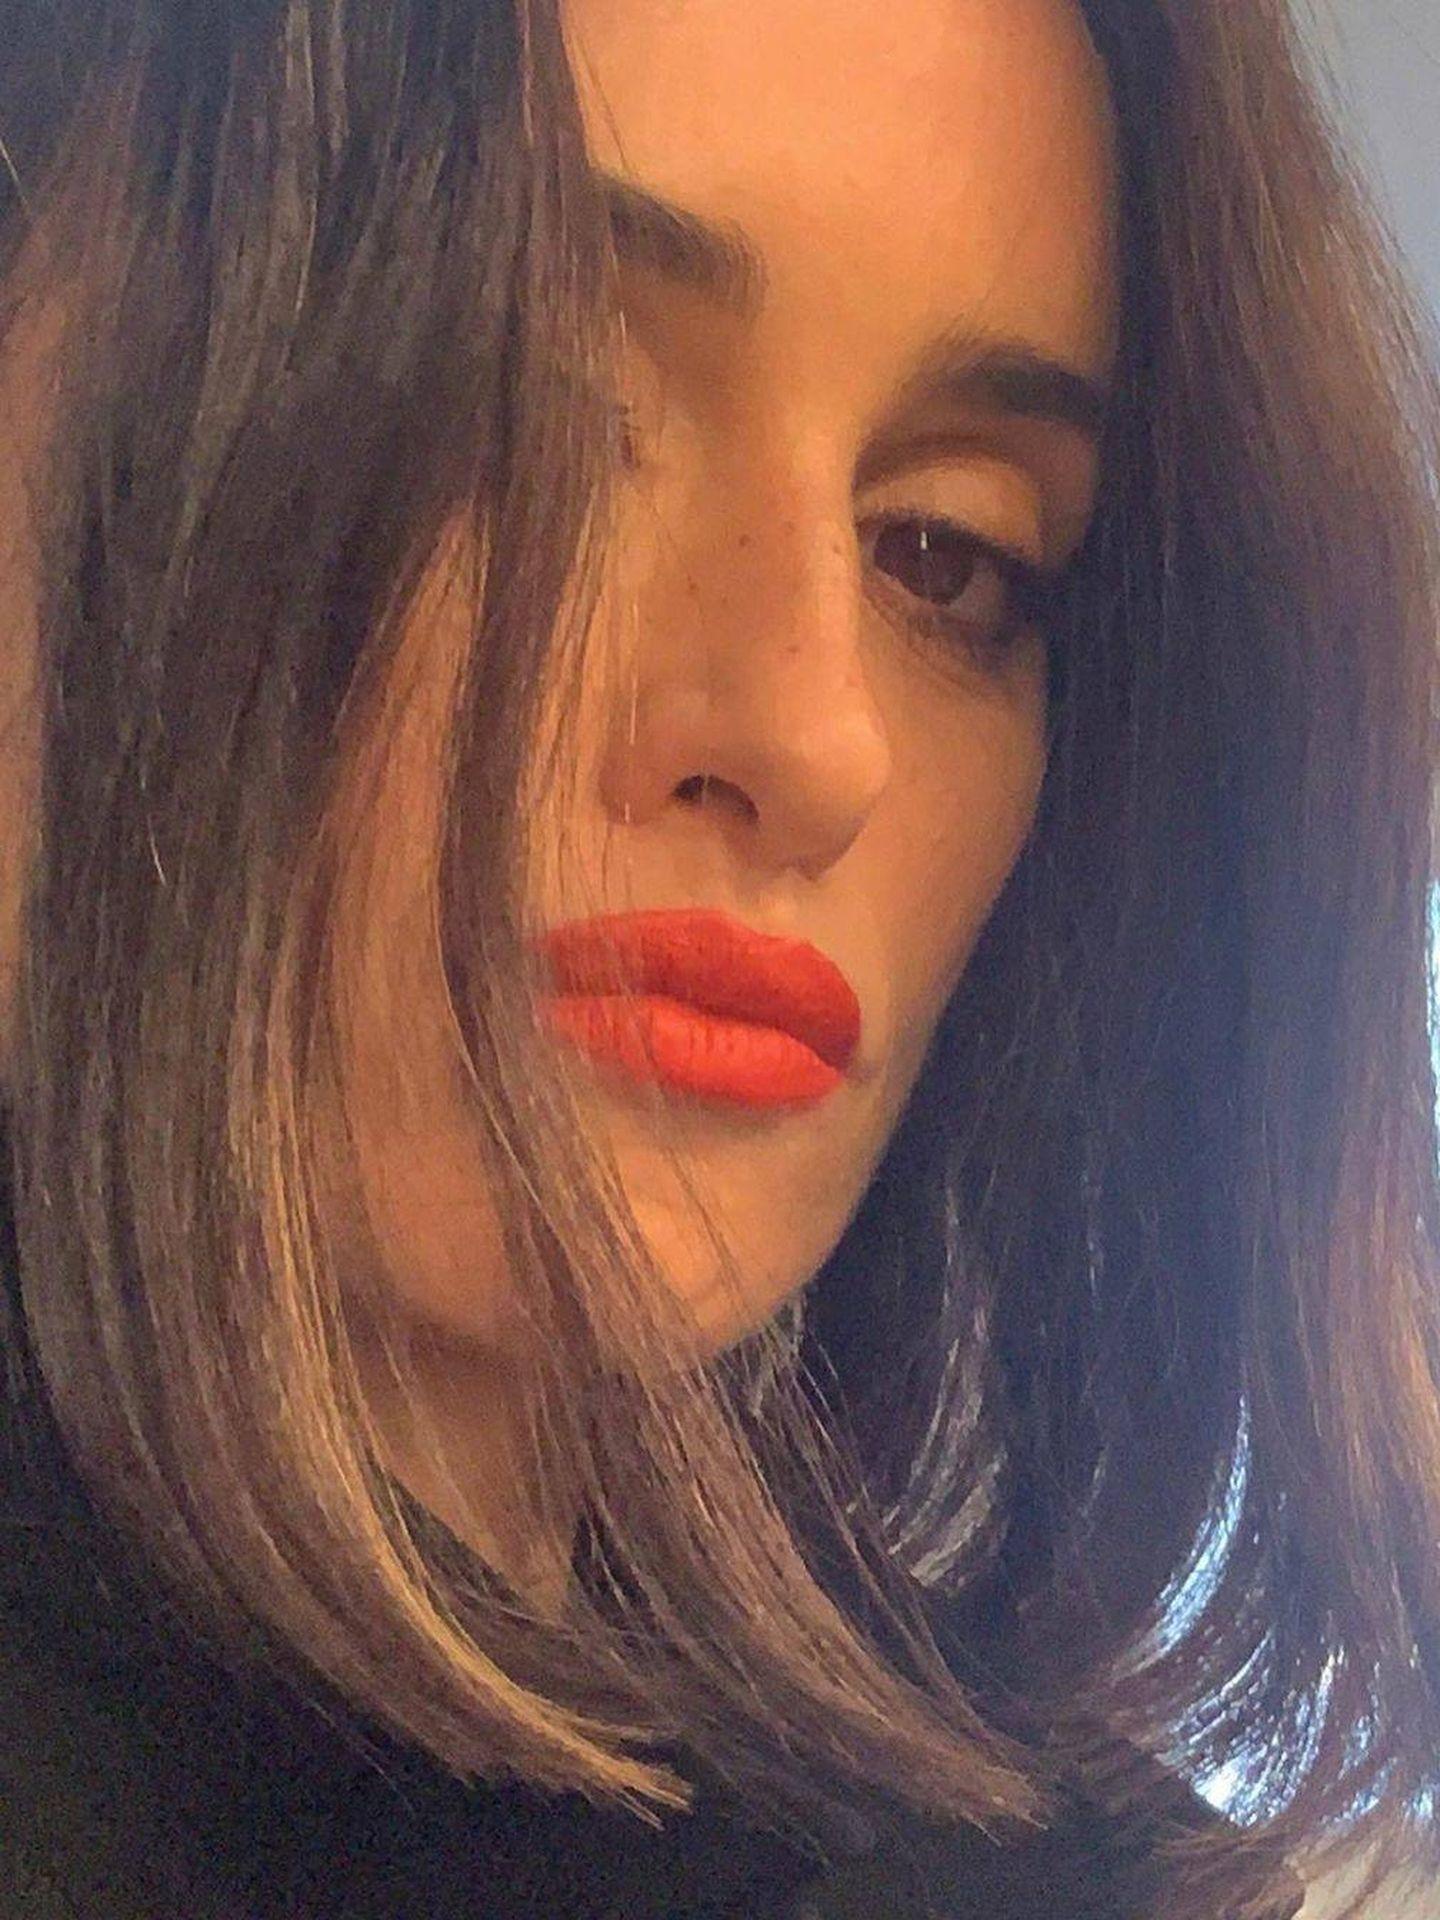 Detalle del maquillaje de Penélope Cruz. (Instagram @penelopecruzoficial)